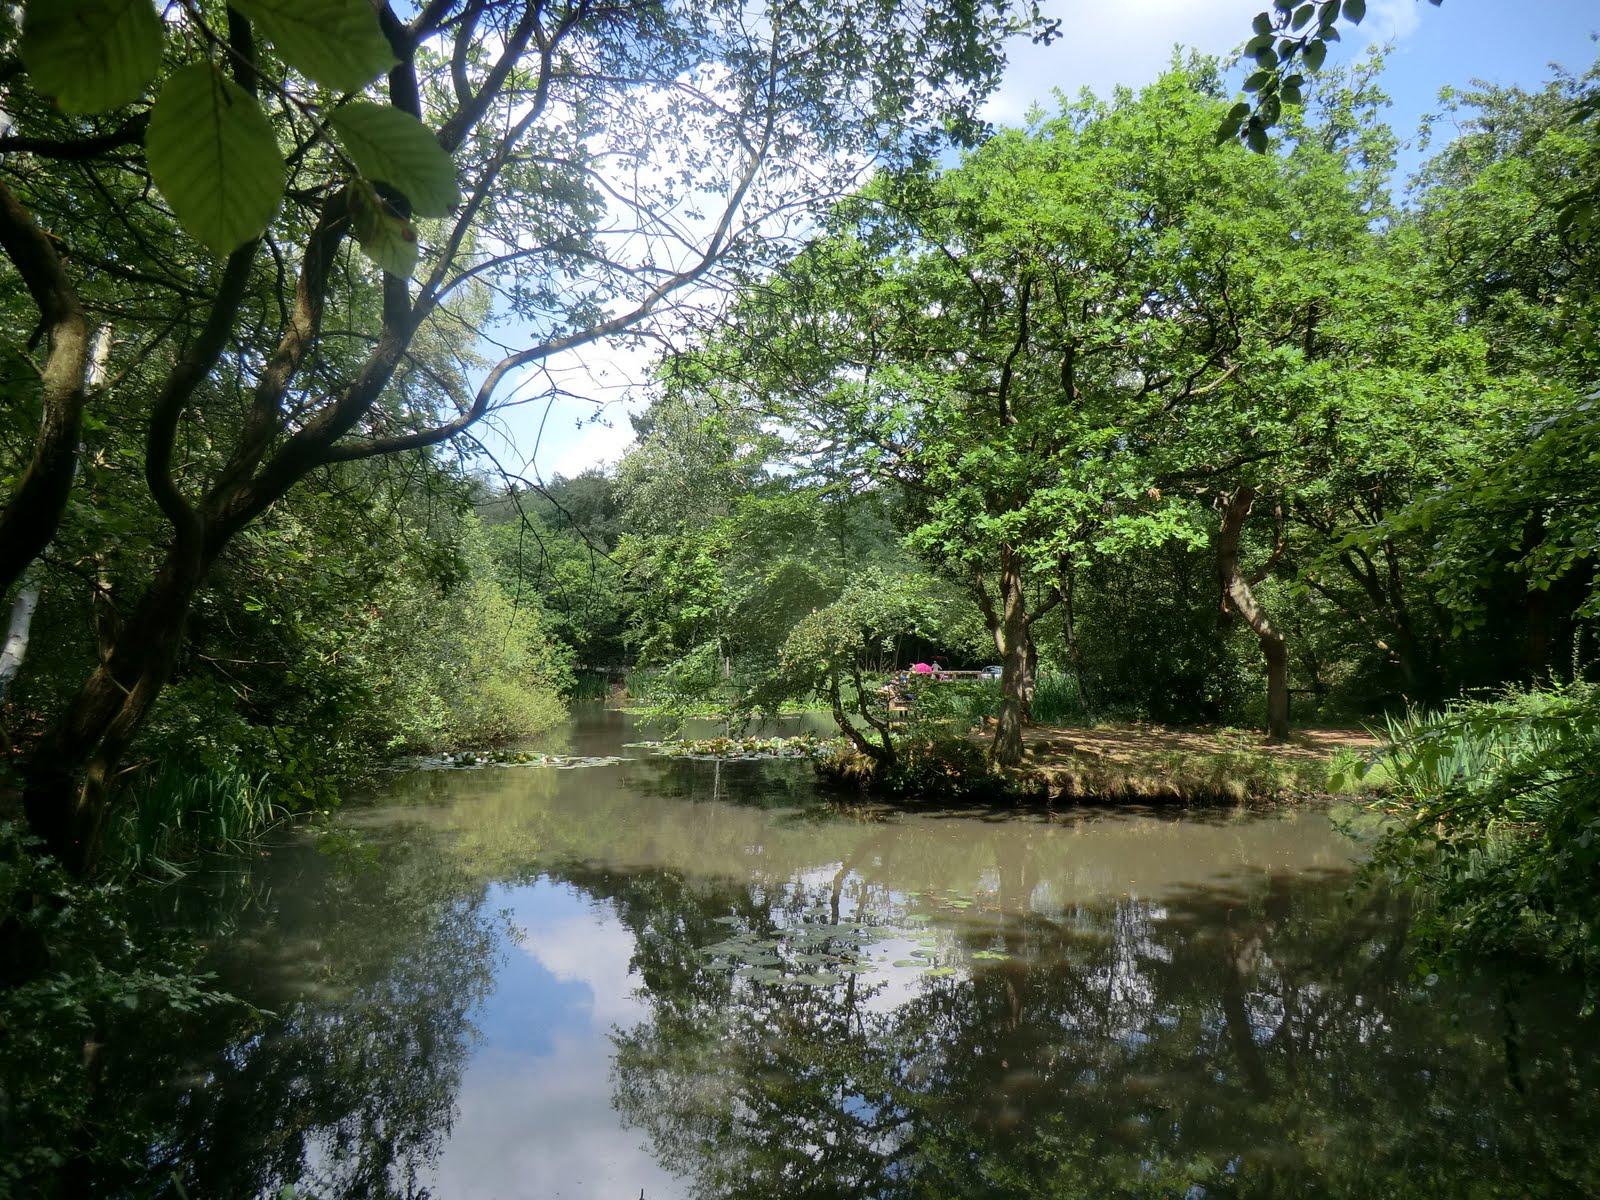 CIMG3211 Pond, Epping Forest